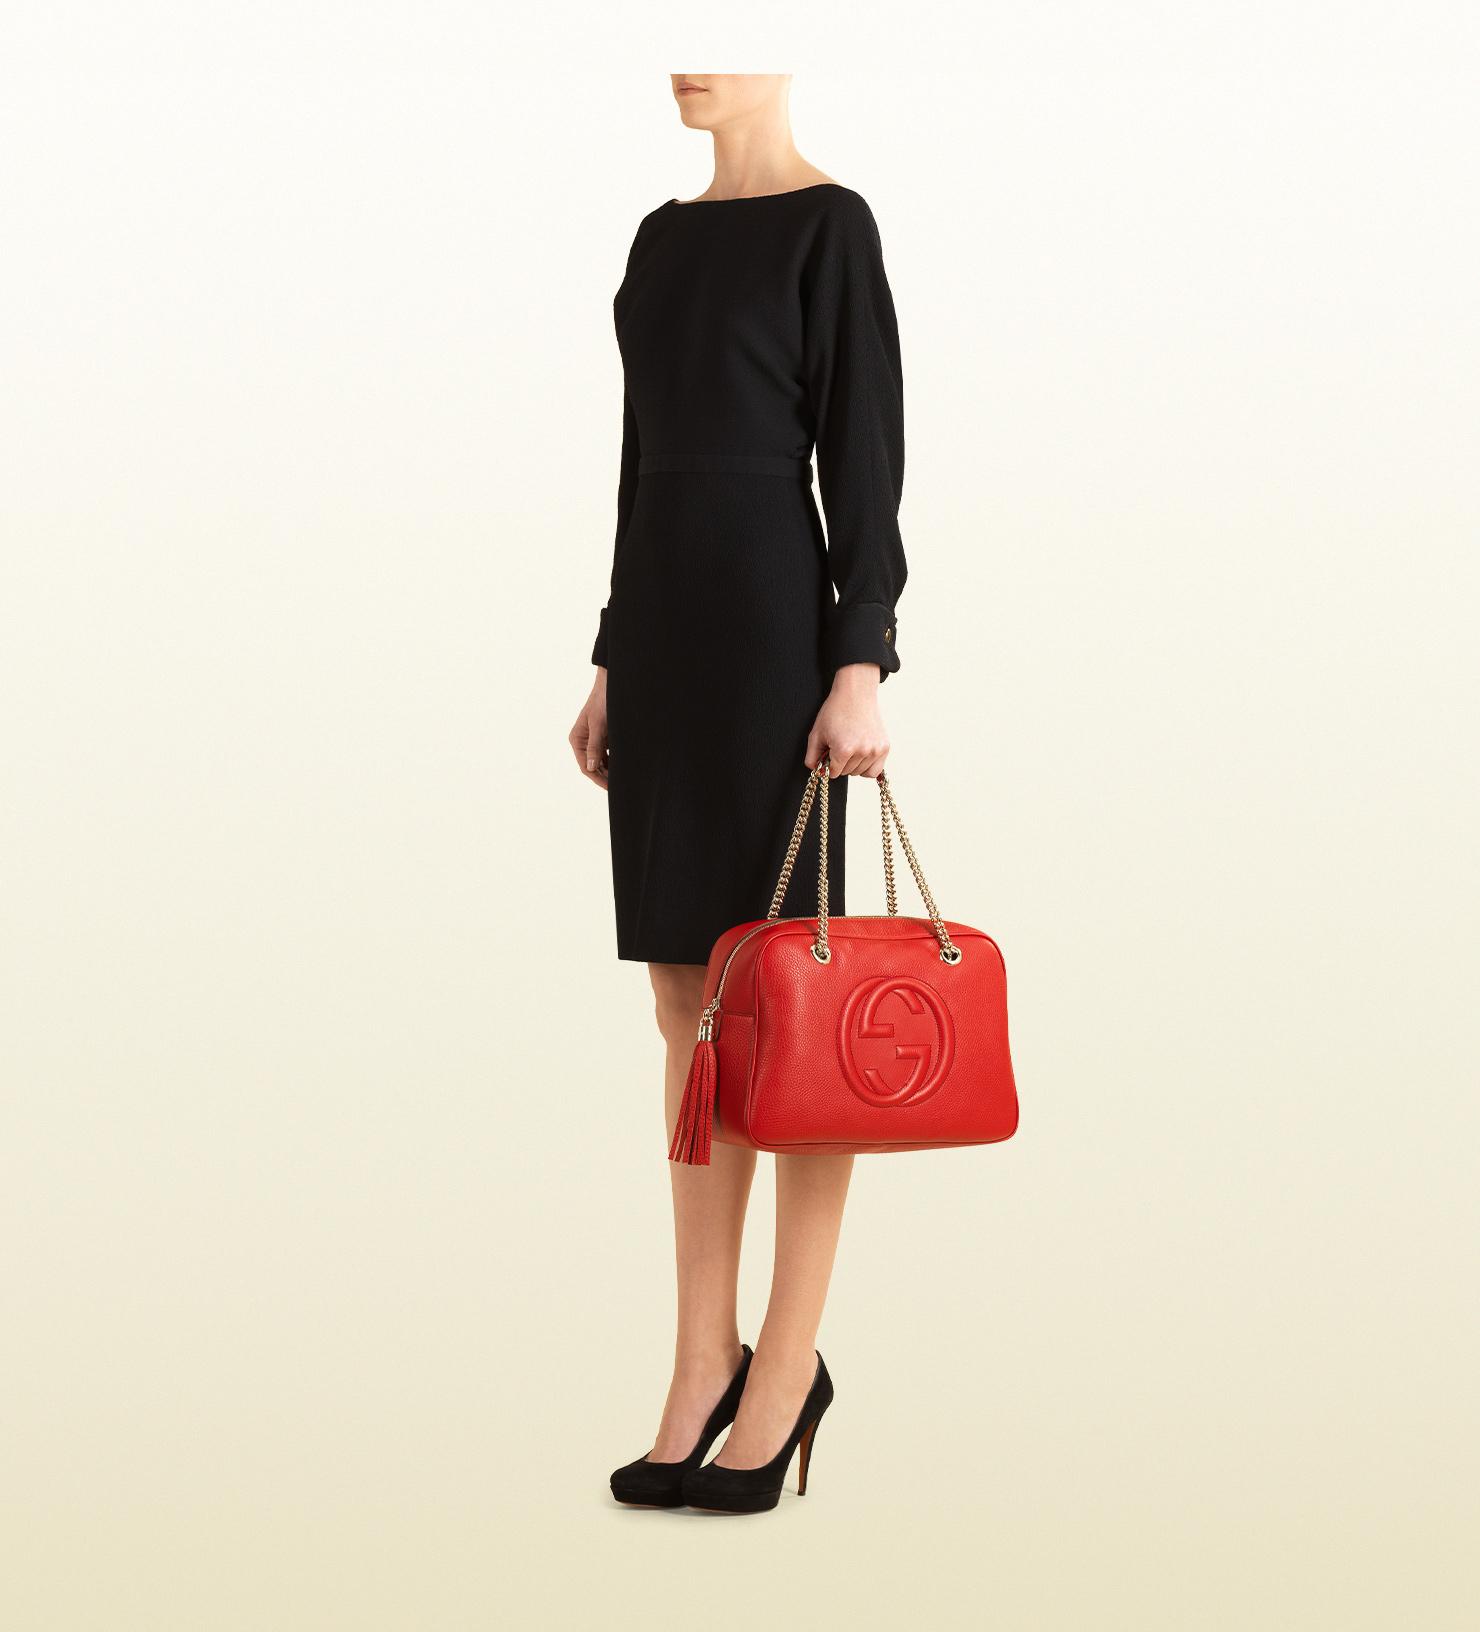 9bec0c27c09a Gucci Soho Leather Chain Shoulder Bag - Bag Photos and Wallpaper HD